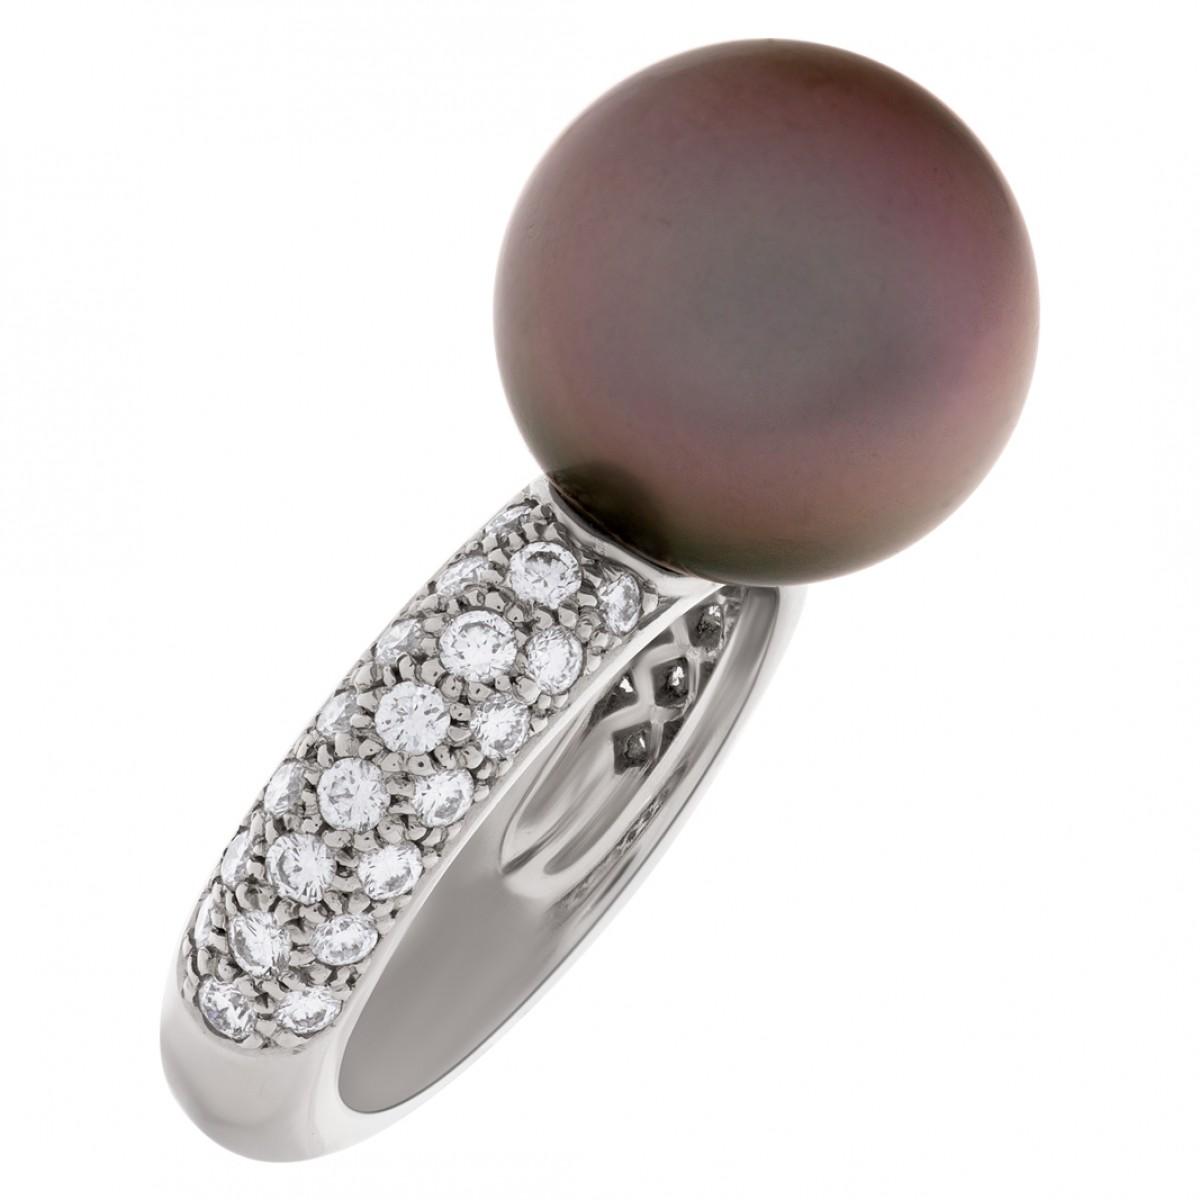 Cartier Tahitian Black Pearl And Diamond Ring